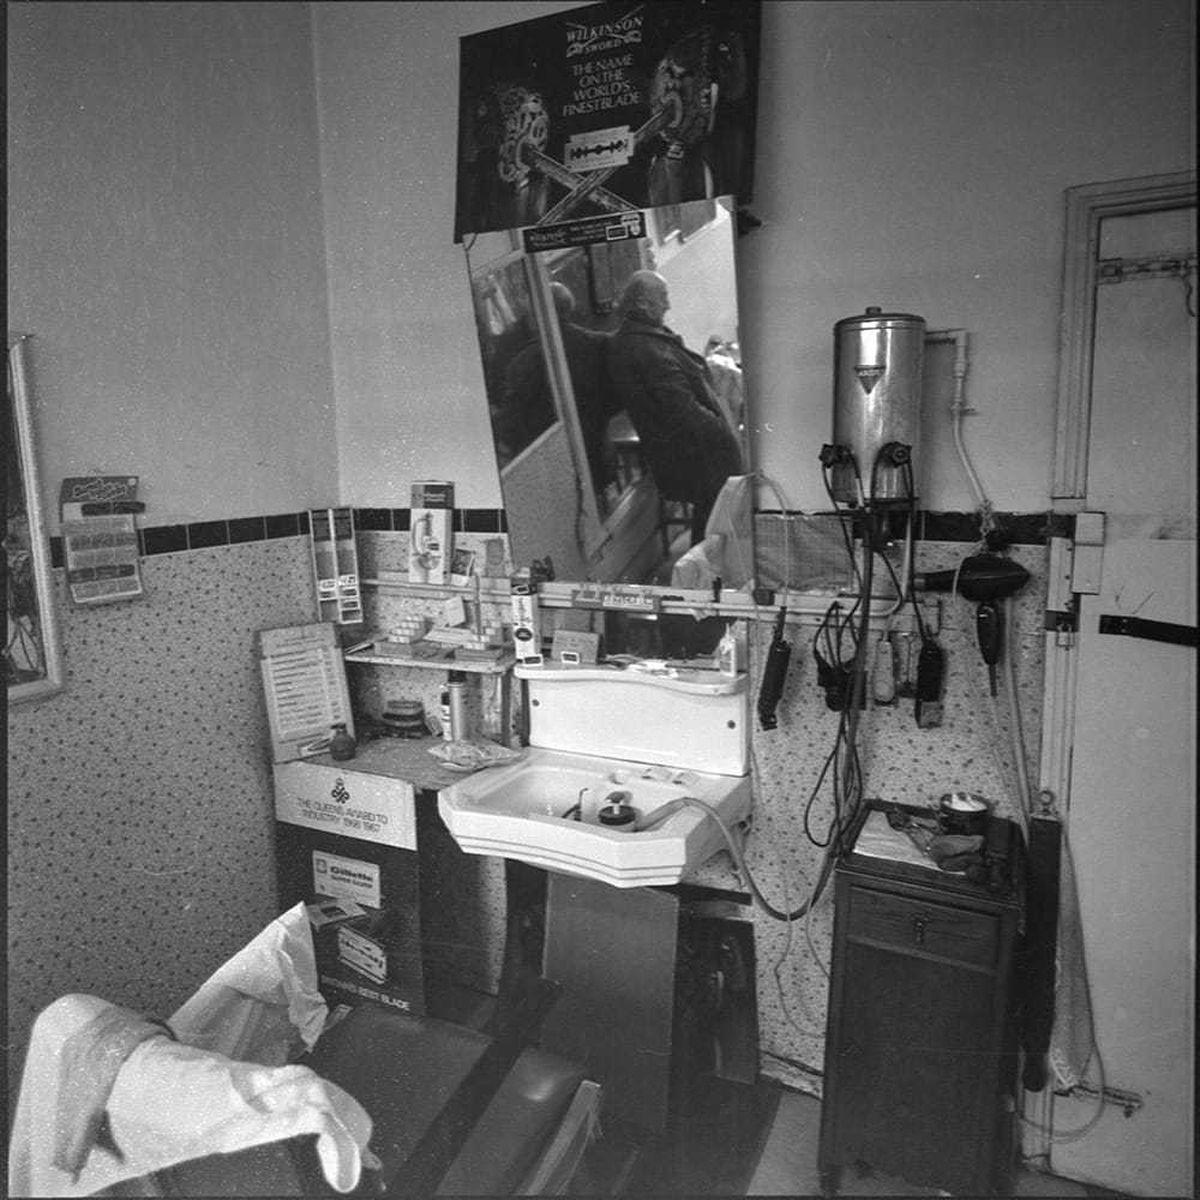 Inside Teddy McGovan's barbershop